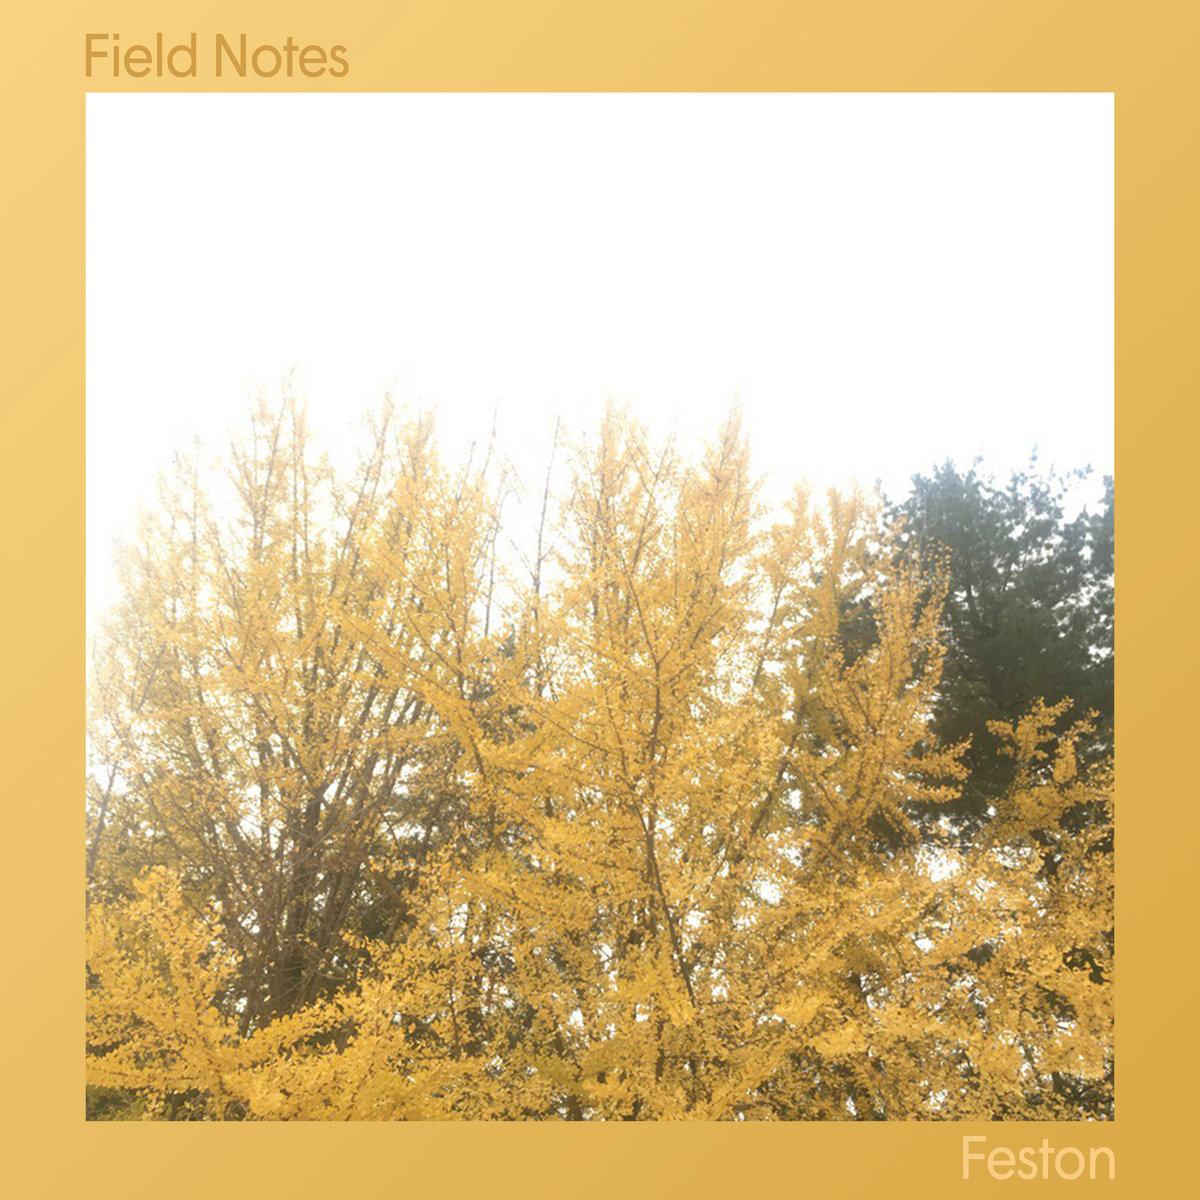 Feston - Field Notes